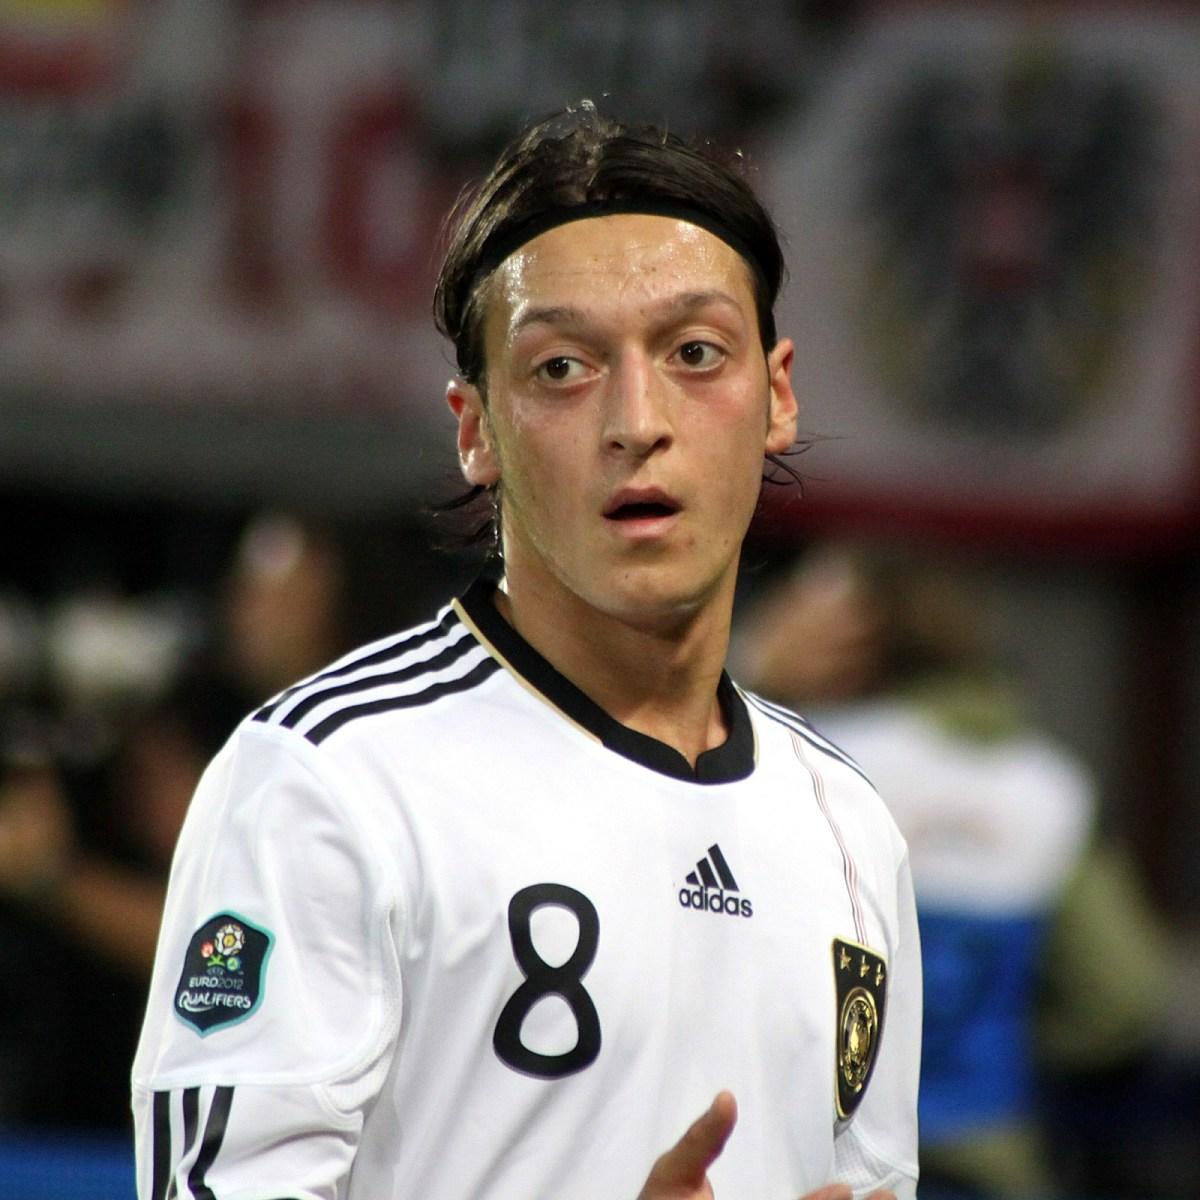 Is Mesut Ozil Muslim?